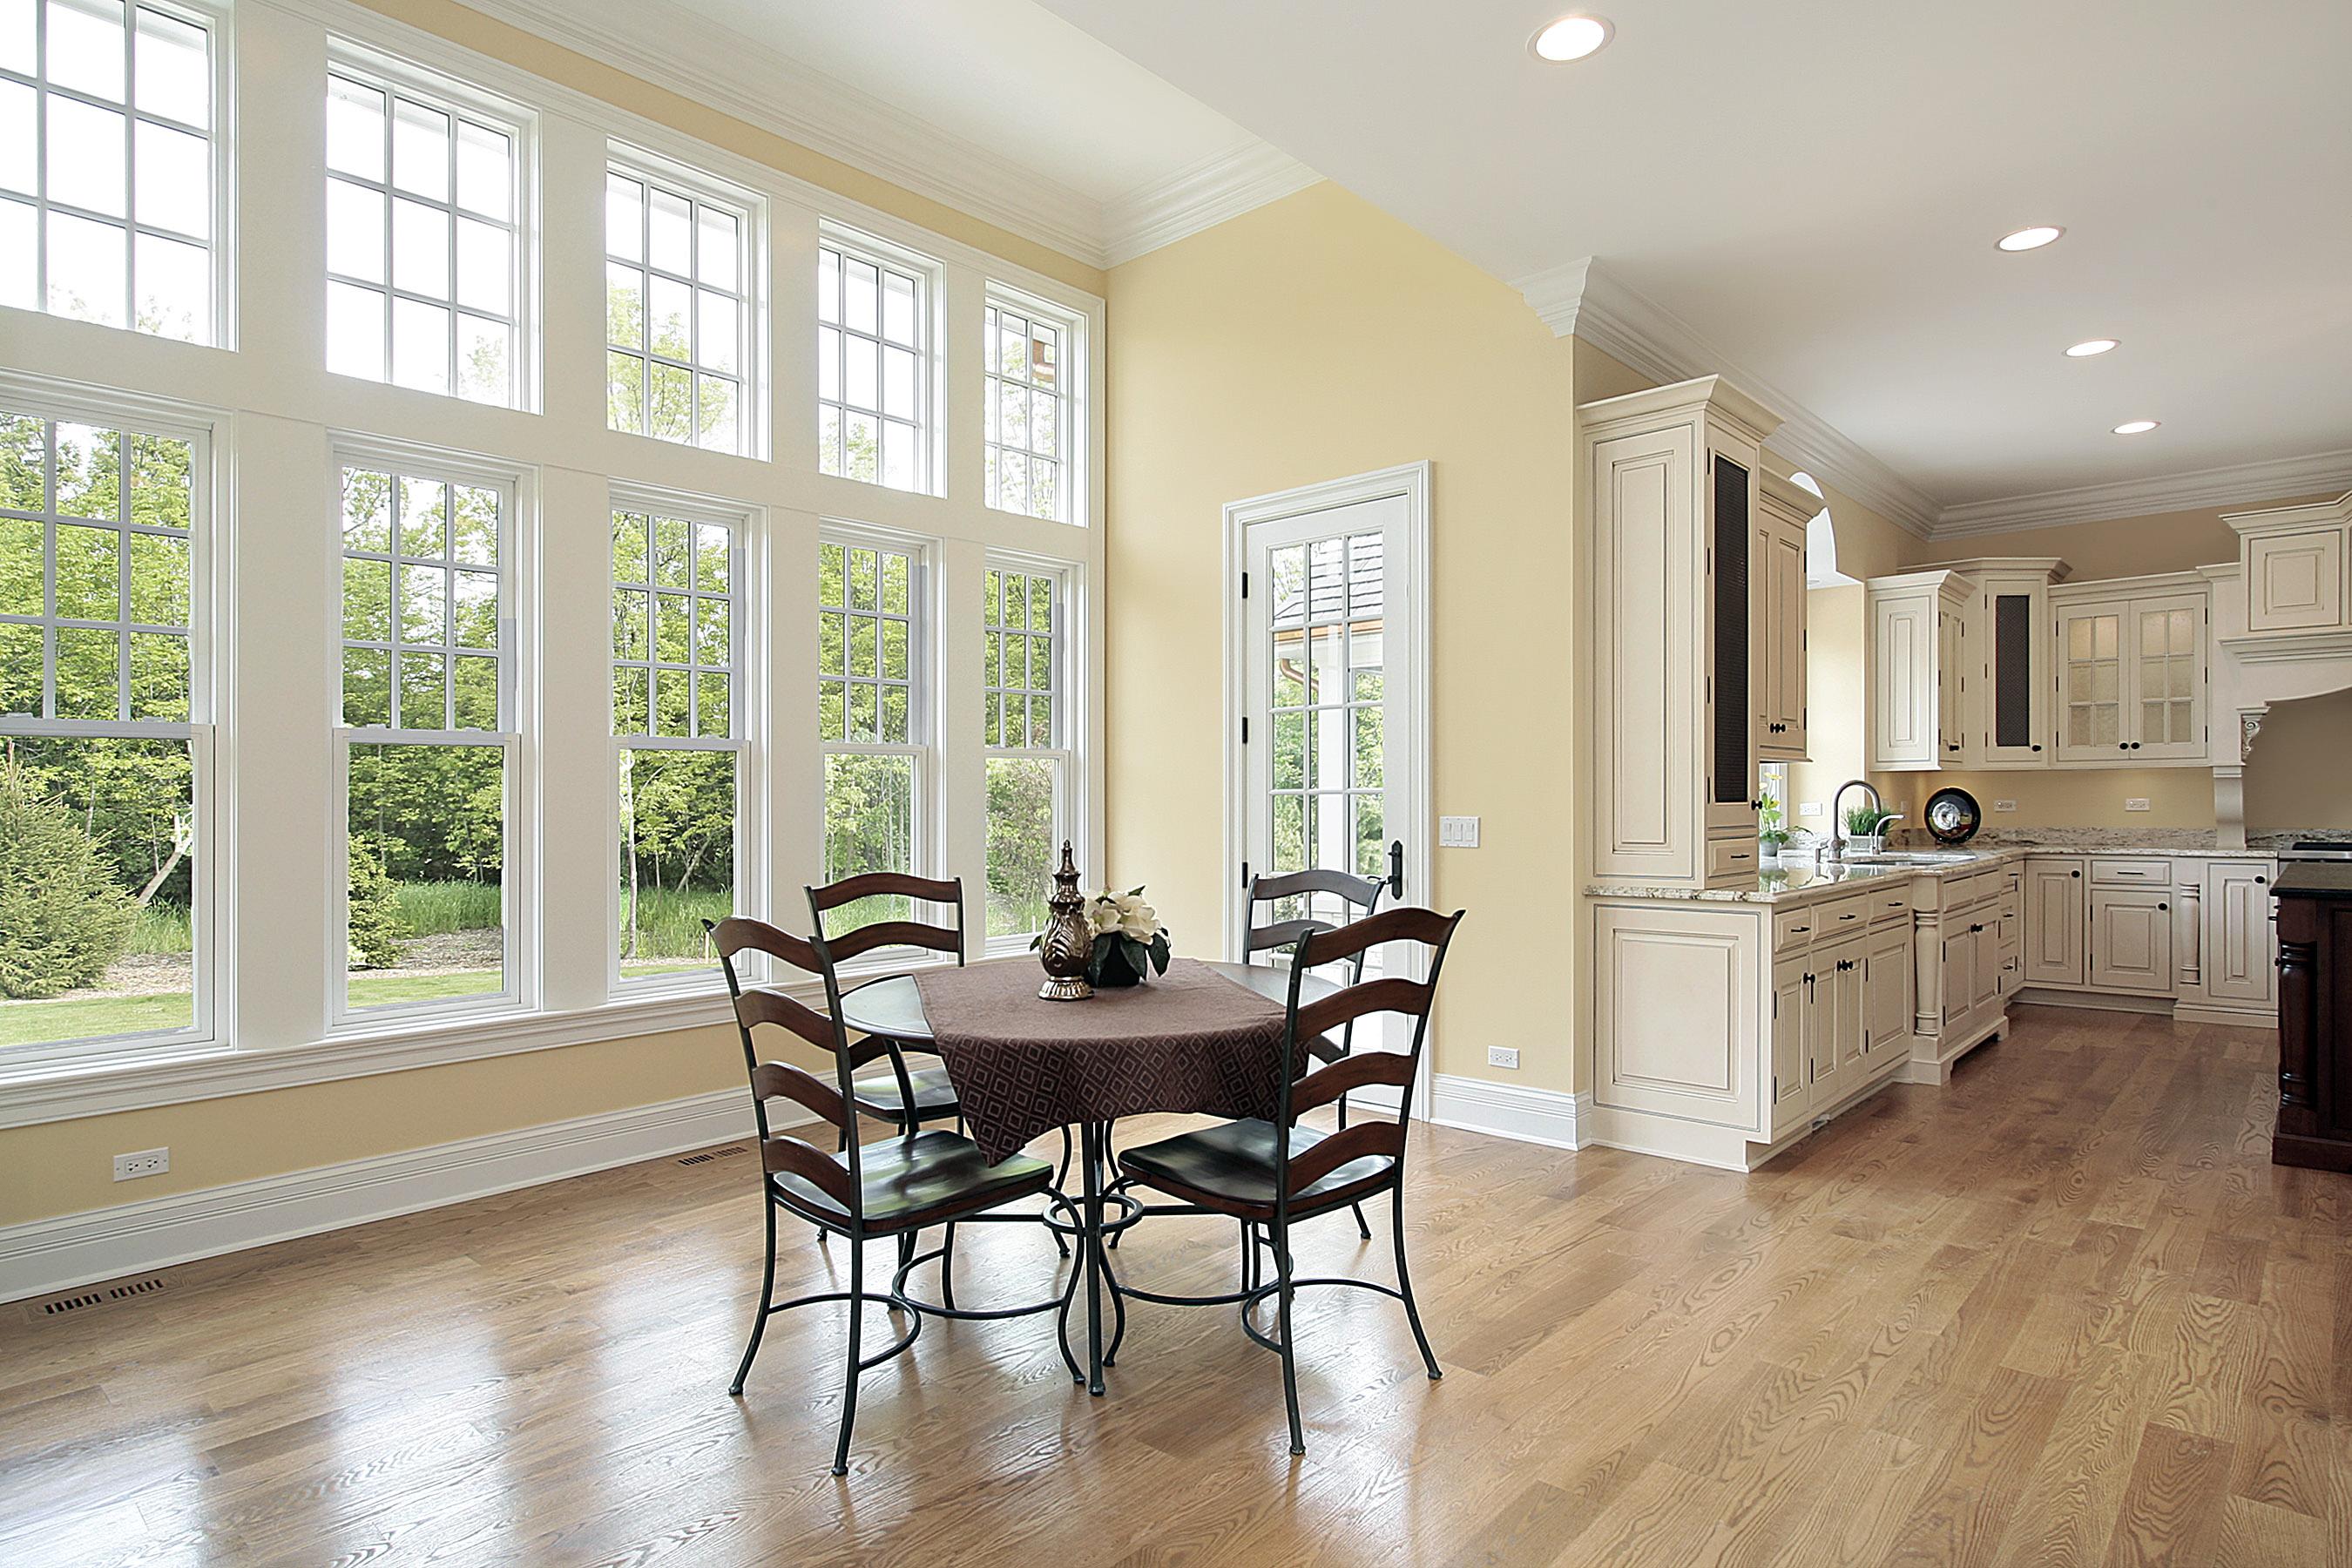 Windows in Cary NC, Goldsboro, North Carolina, Raleigh, Wendell